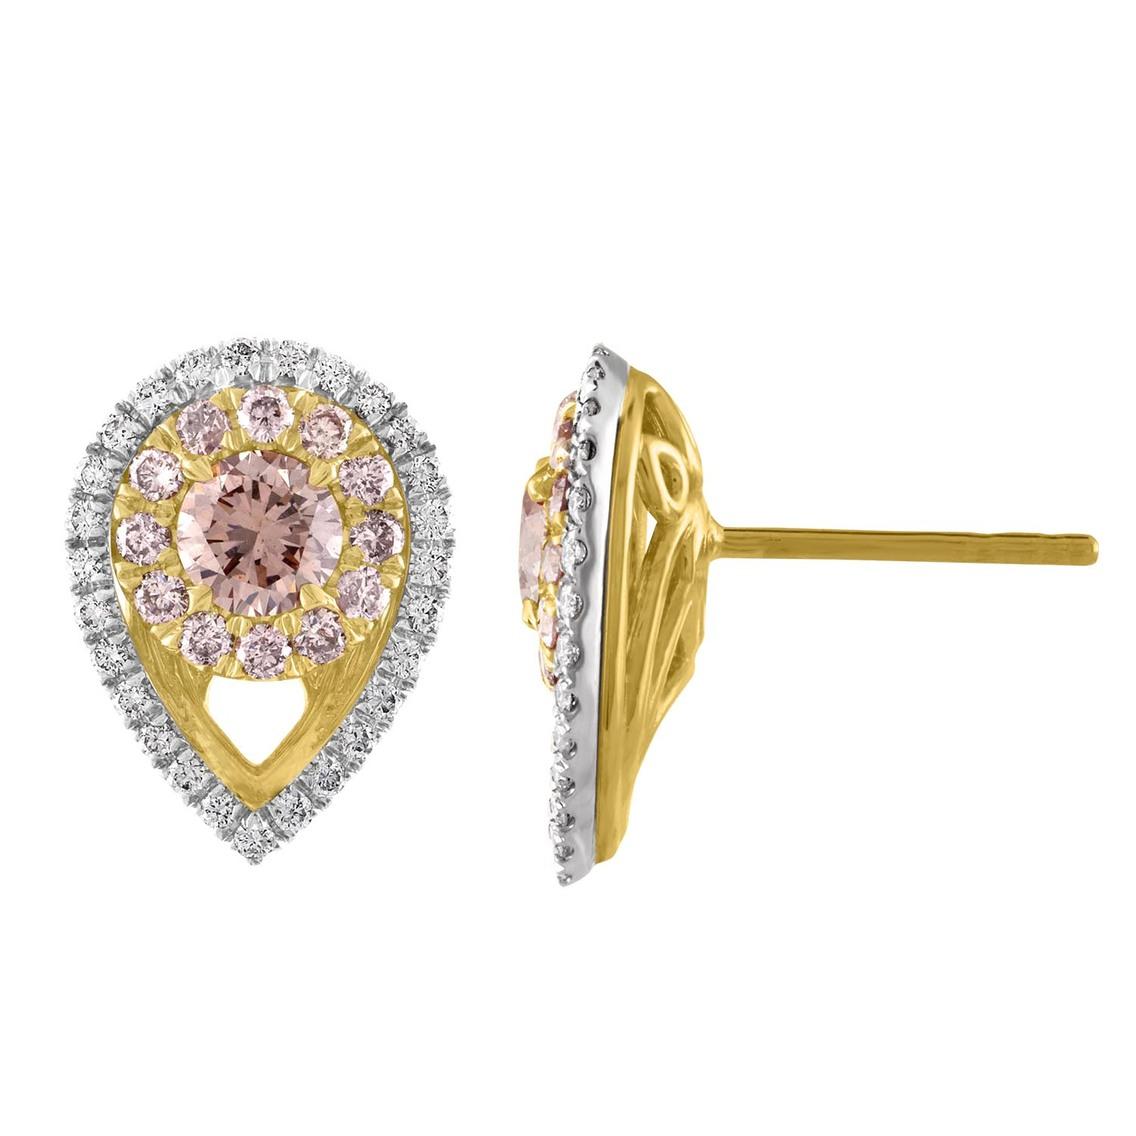 MJS Diamonds - Jewelry / Photography